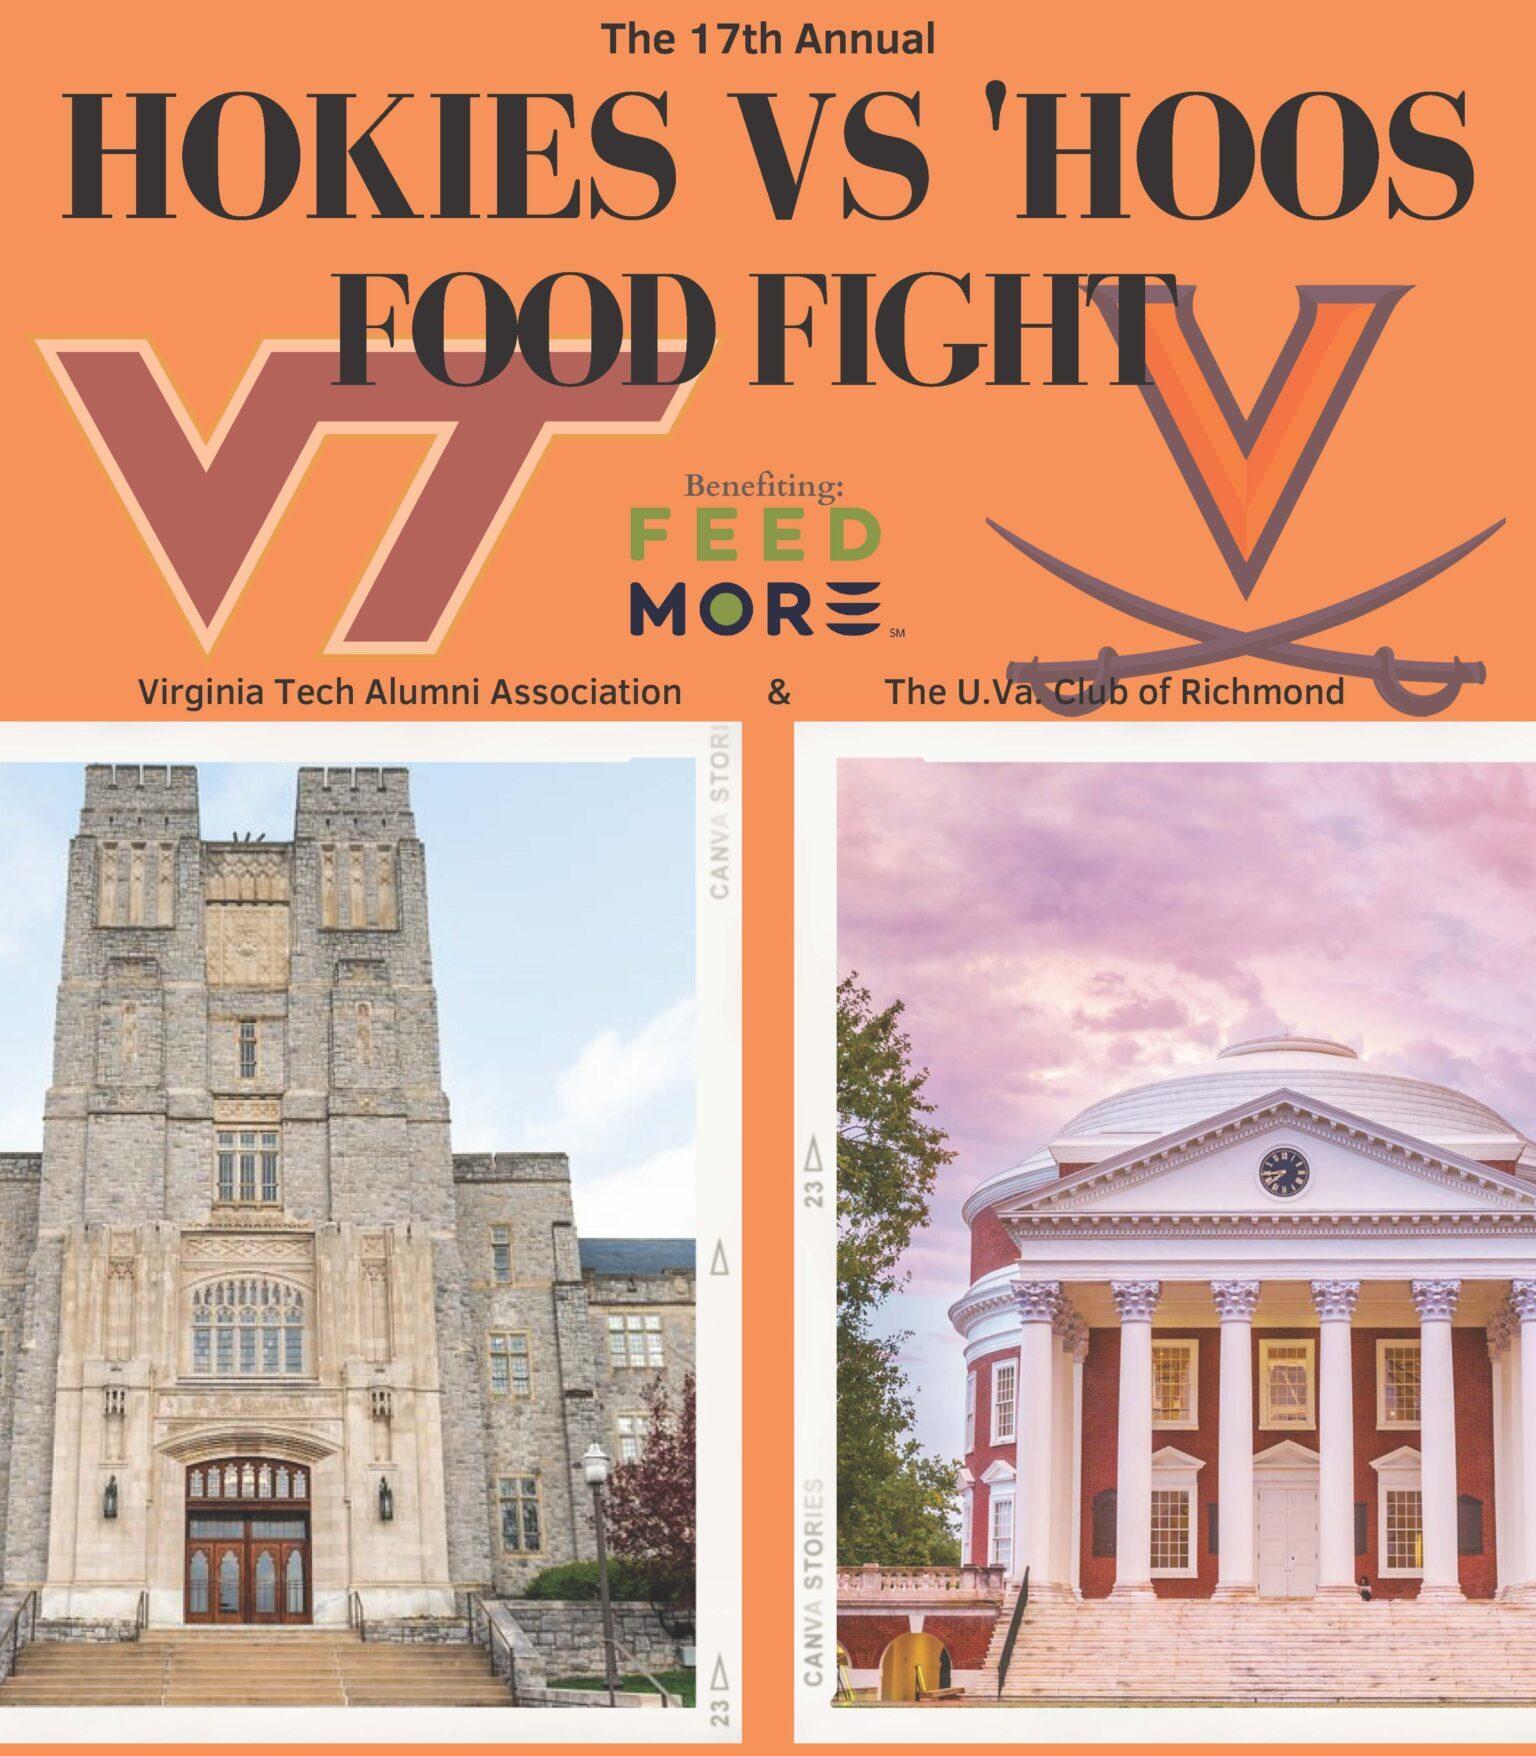 Hokies v Hoos Food Fight